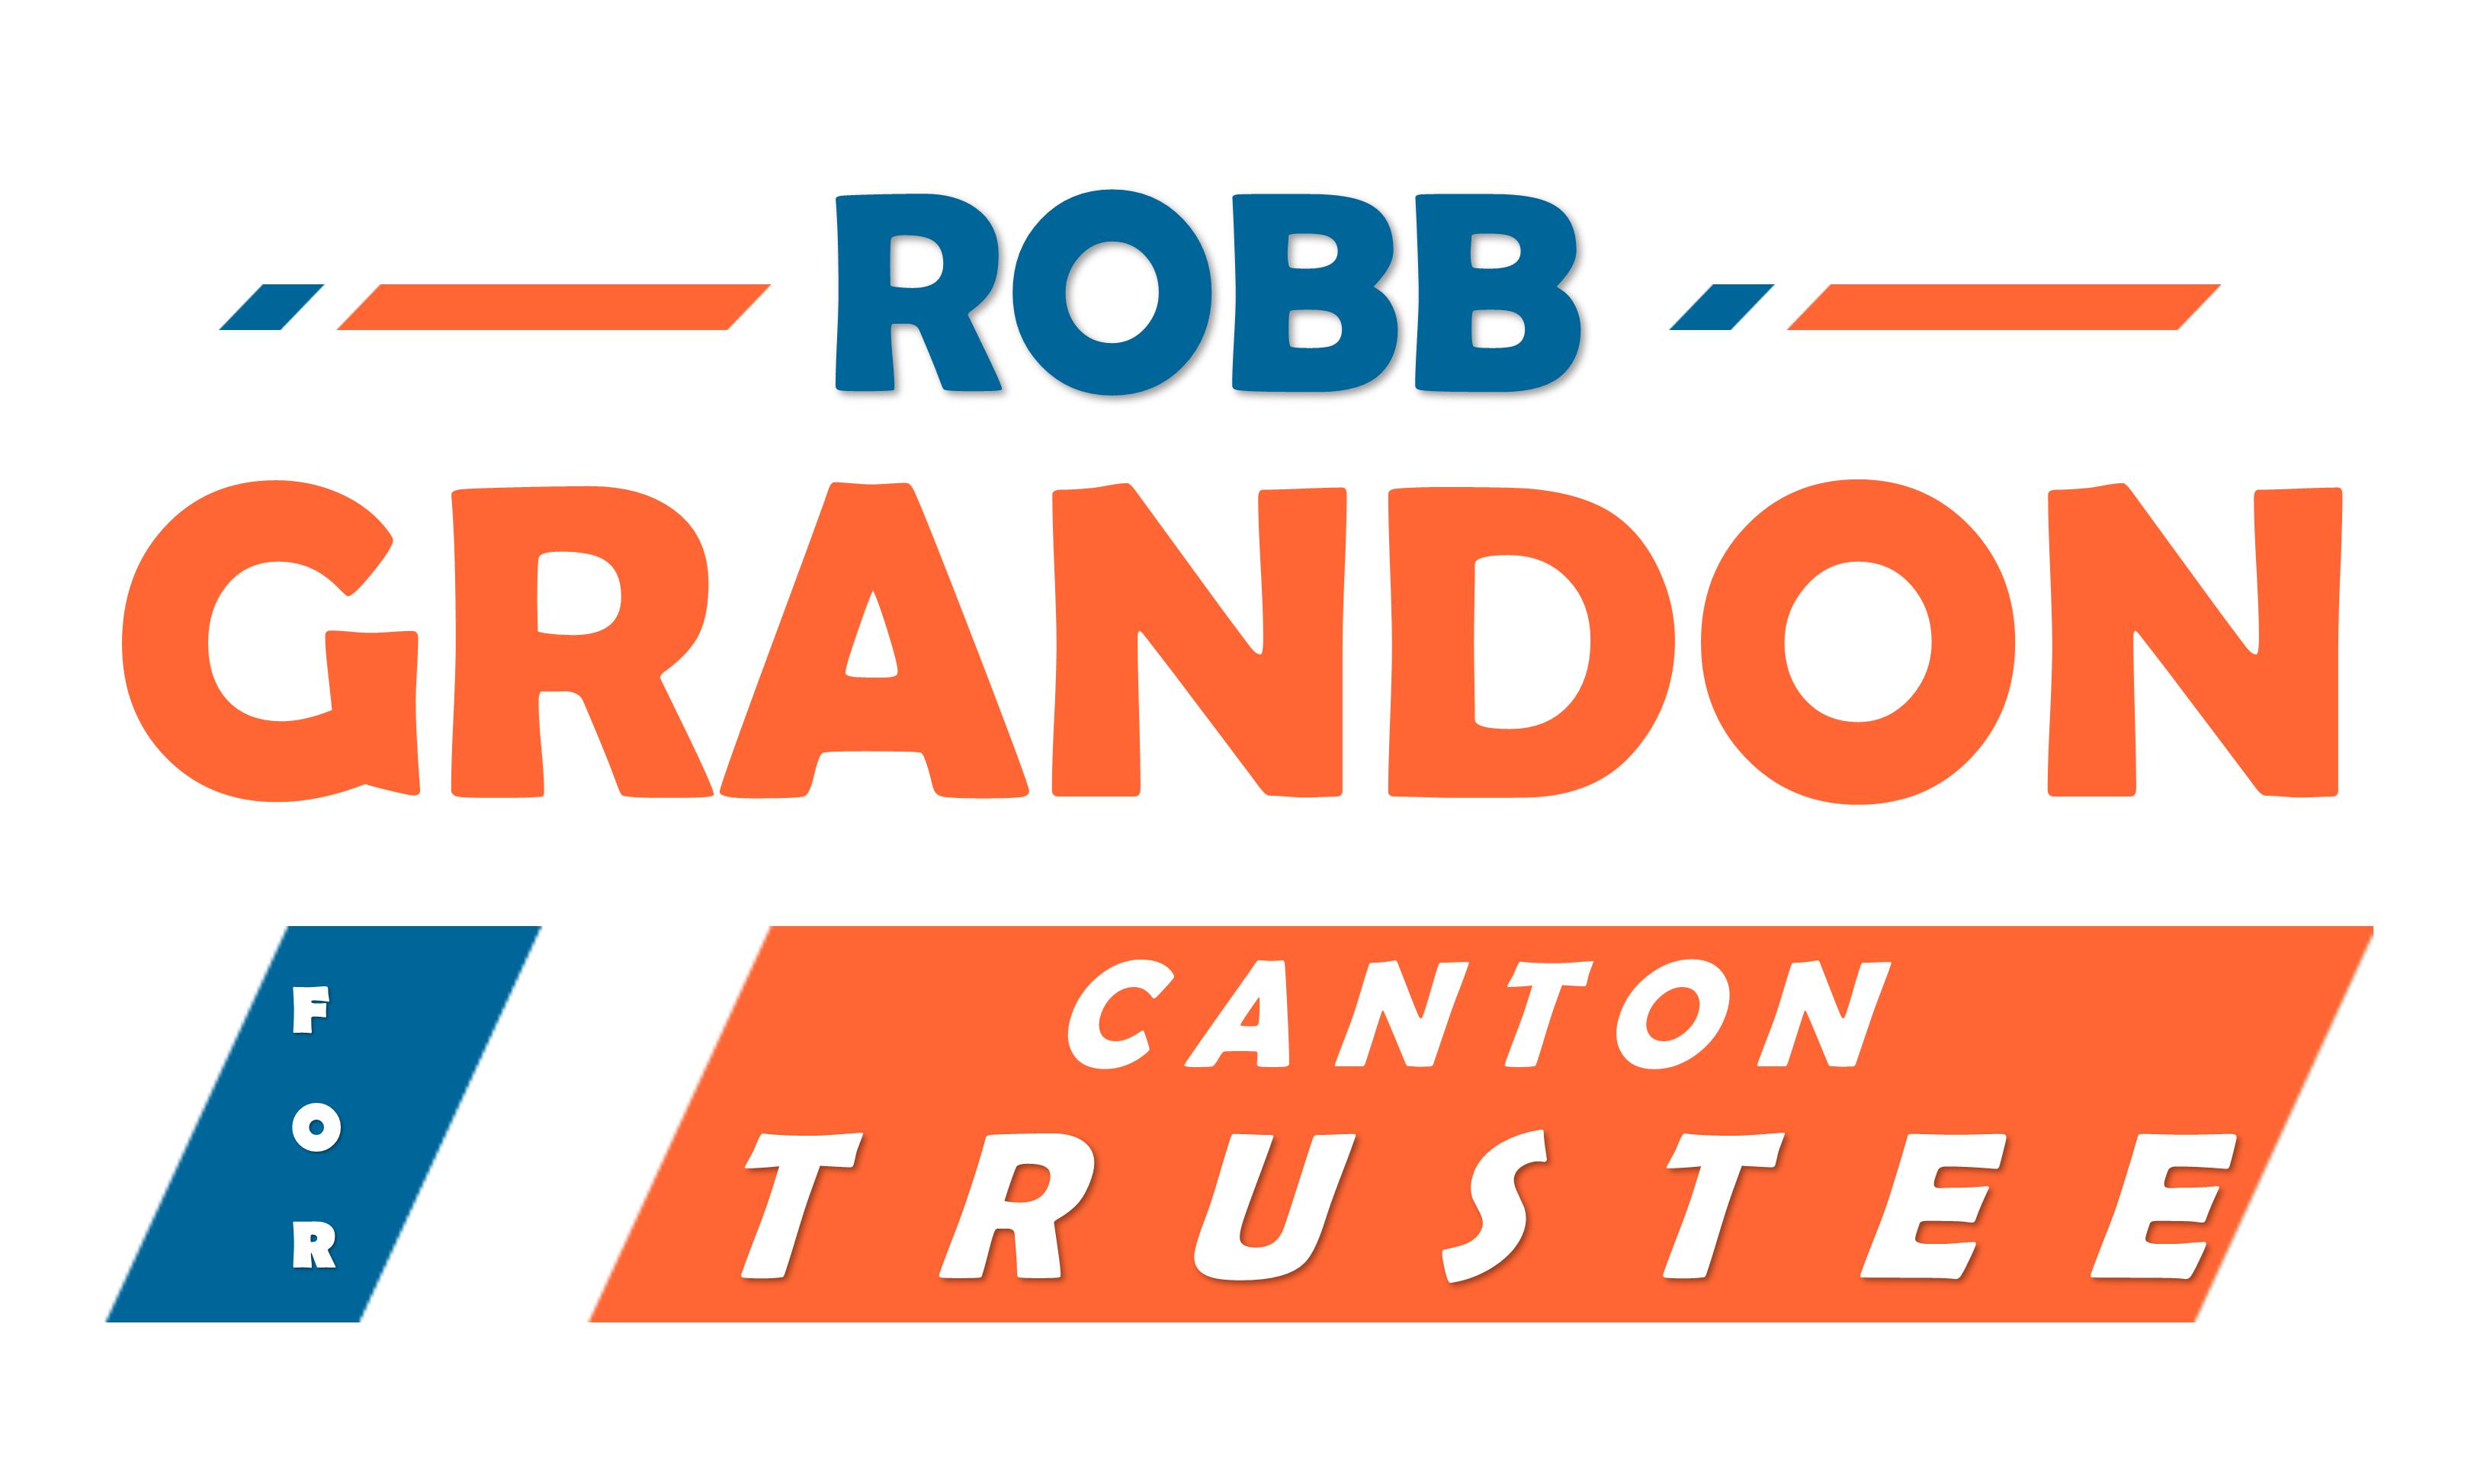 Robb Grandon